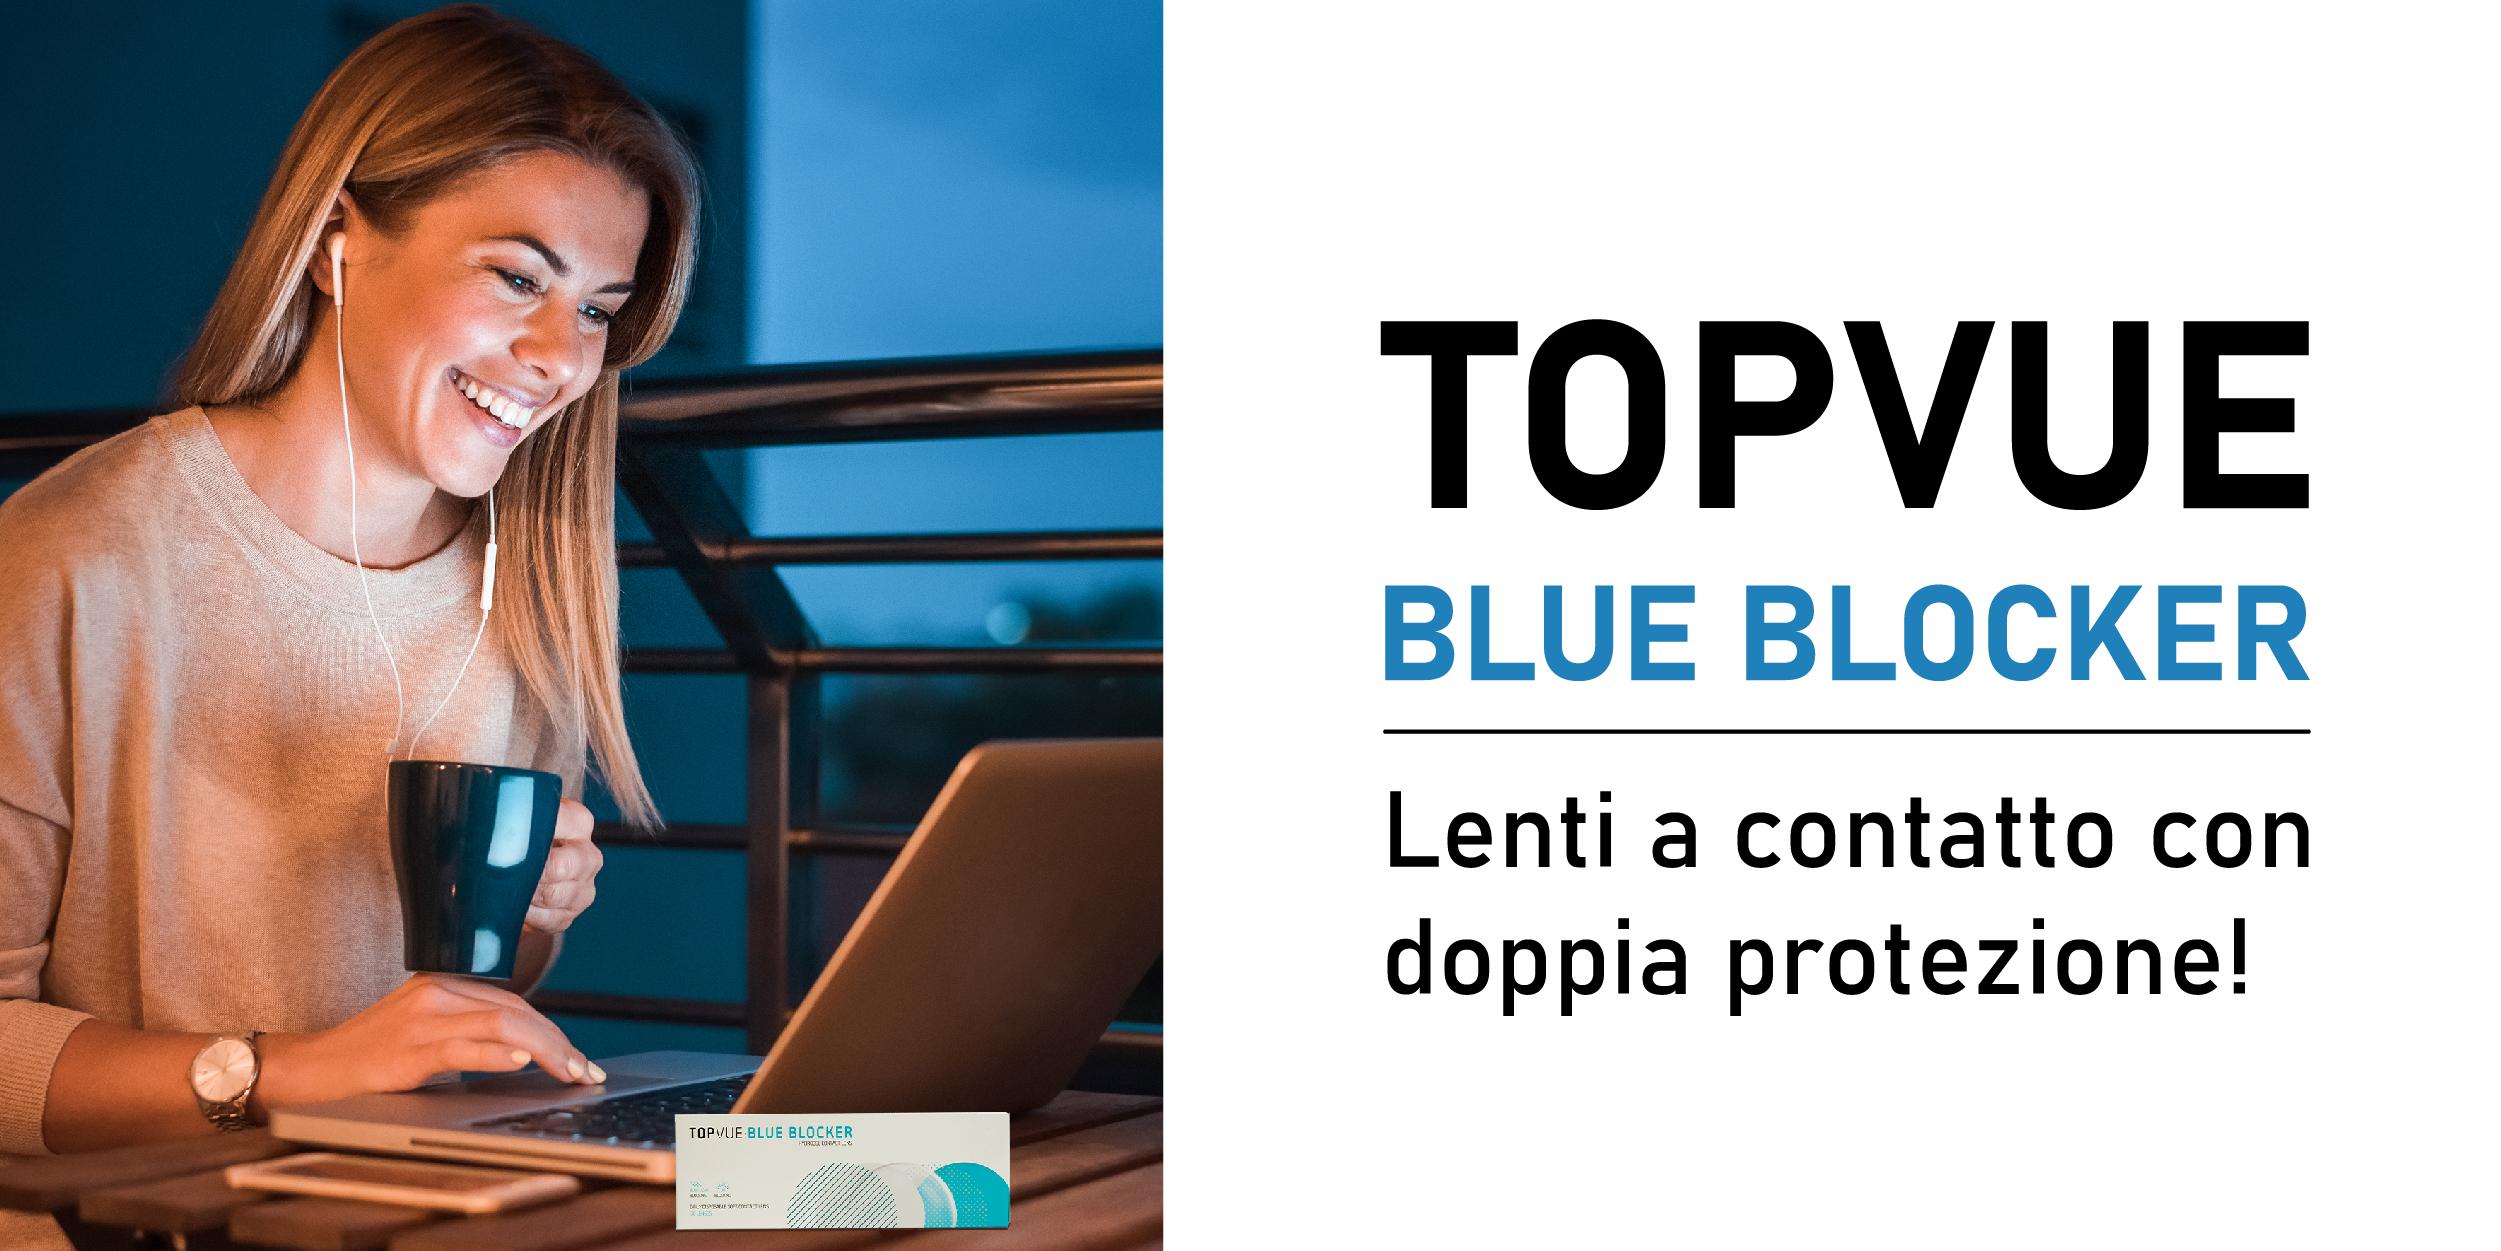 Lenti TopVue Blue Blocker